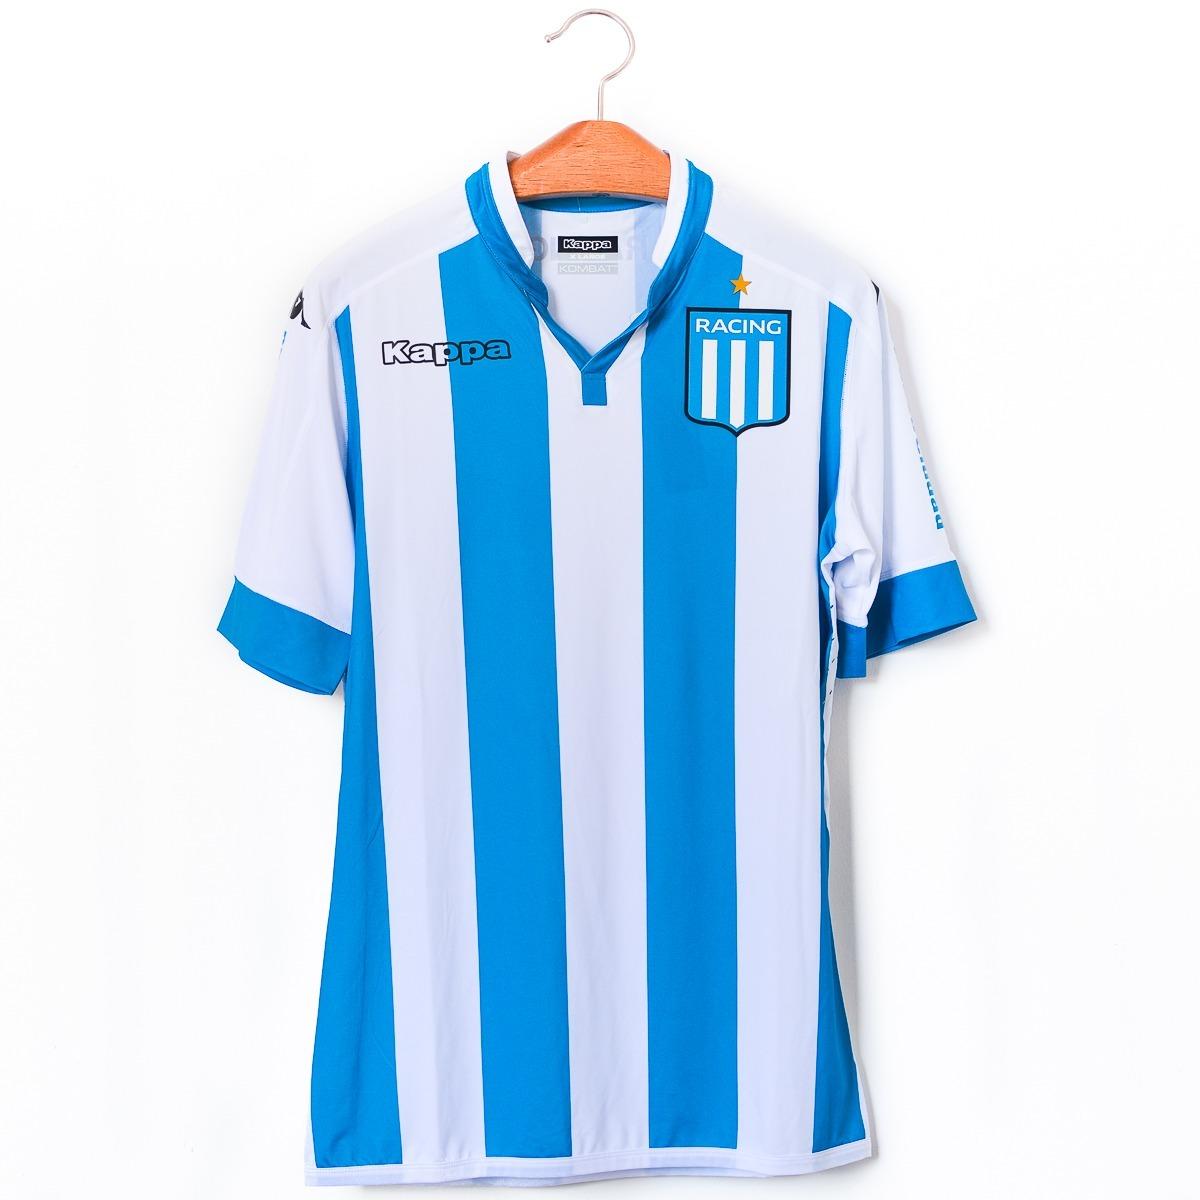 camisas masculinas futebol racing club 17 18 kappa gara. Carregando zoom. 7606763153024